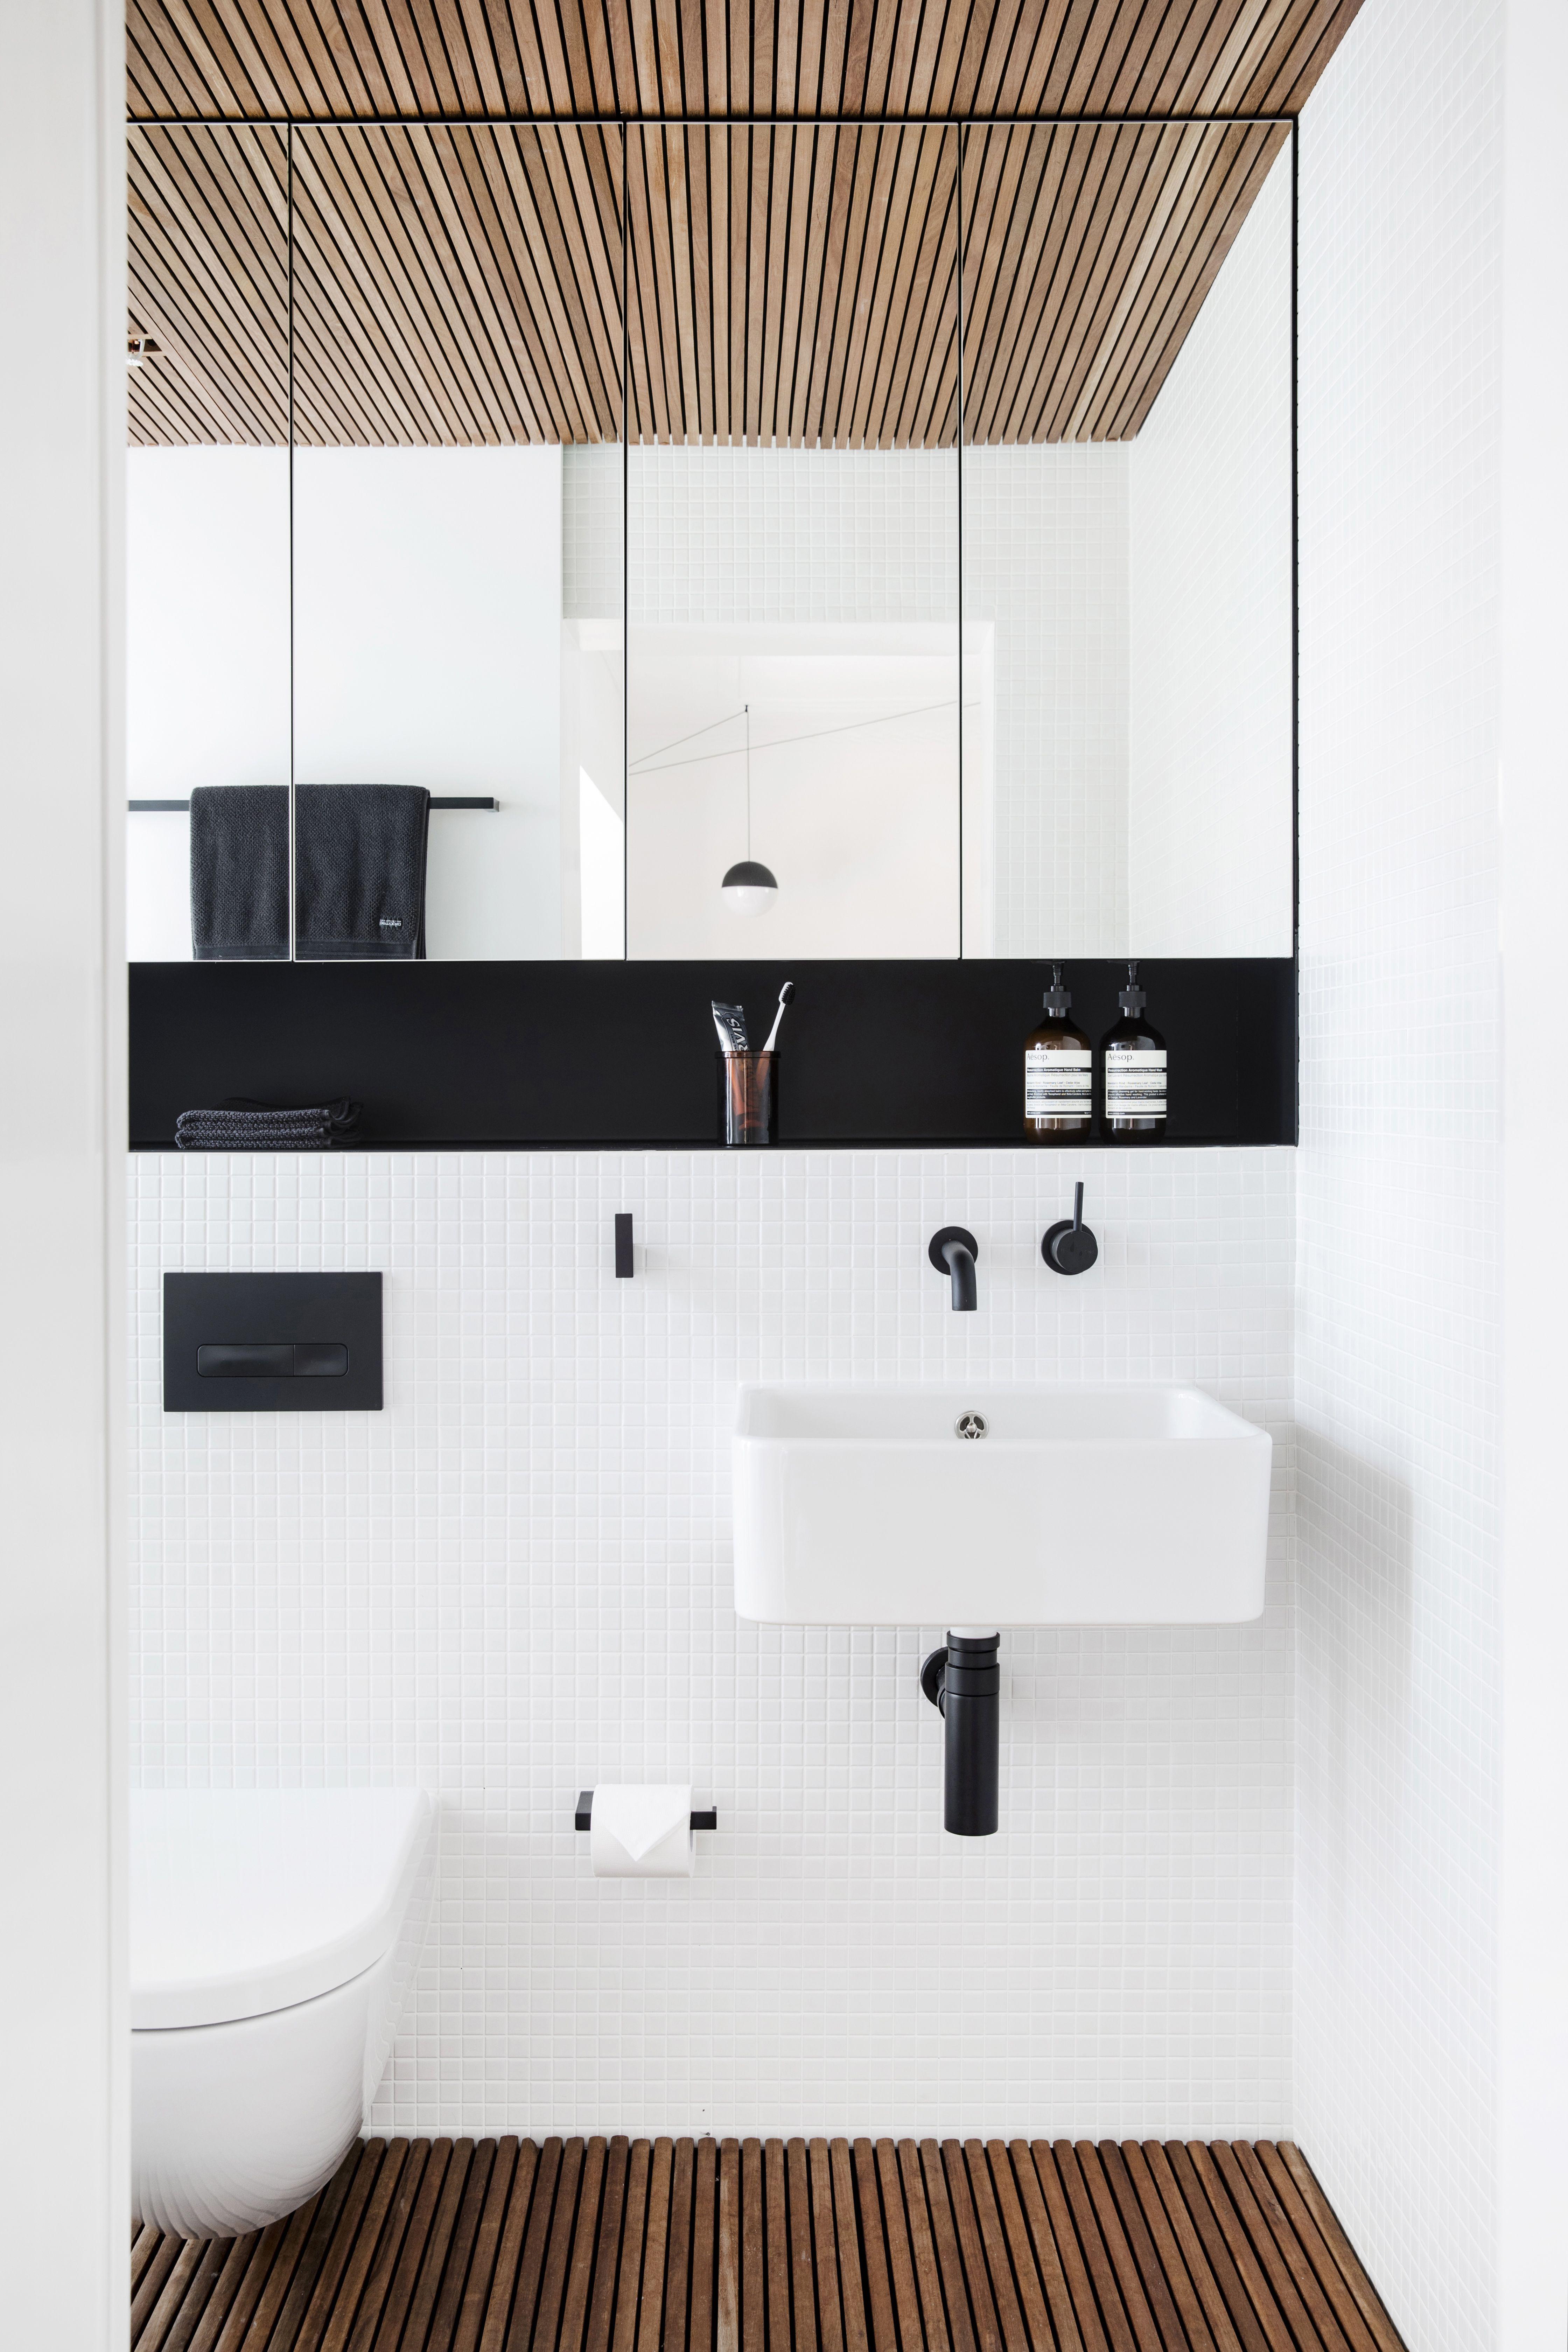 Nano Pad  Sydney Australia Minimalist And Sydney Classy Bathroom Design Australia Design Inspiration